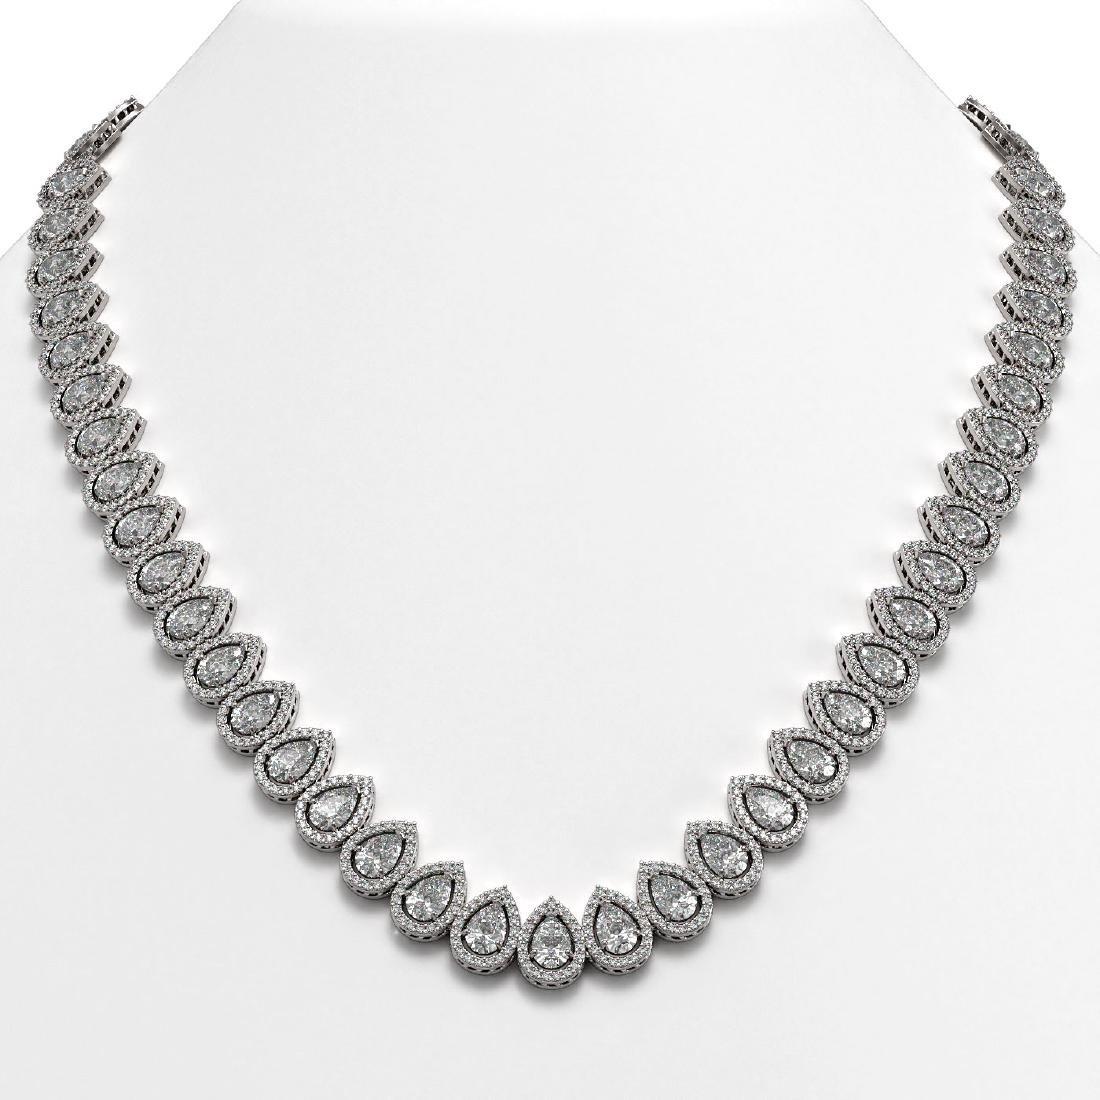 42.11 CTW Pear Diamond Designer Necklace 18K White Gold